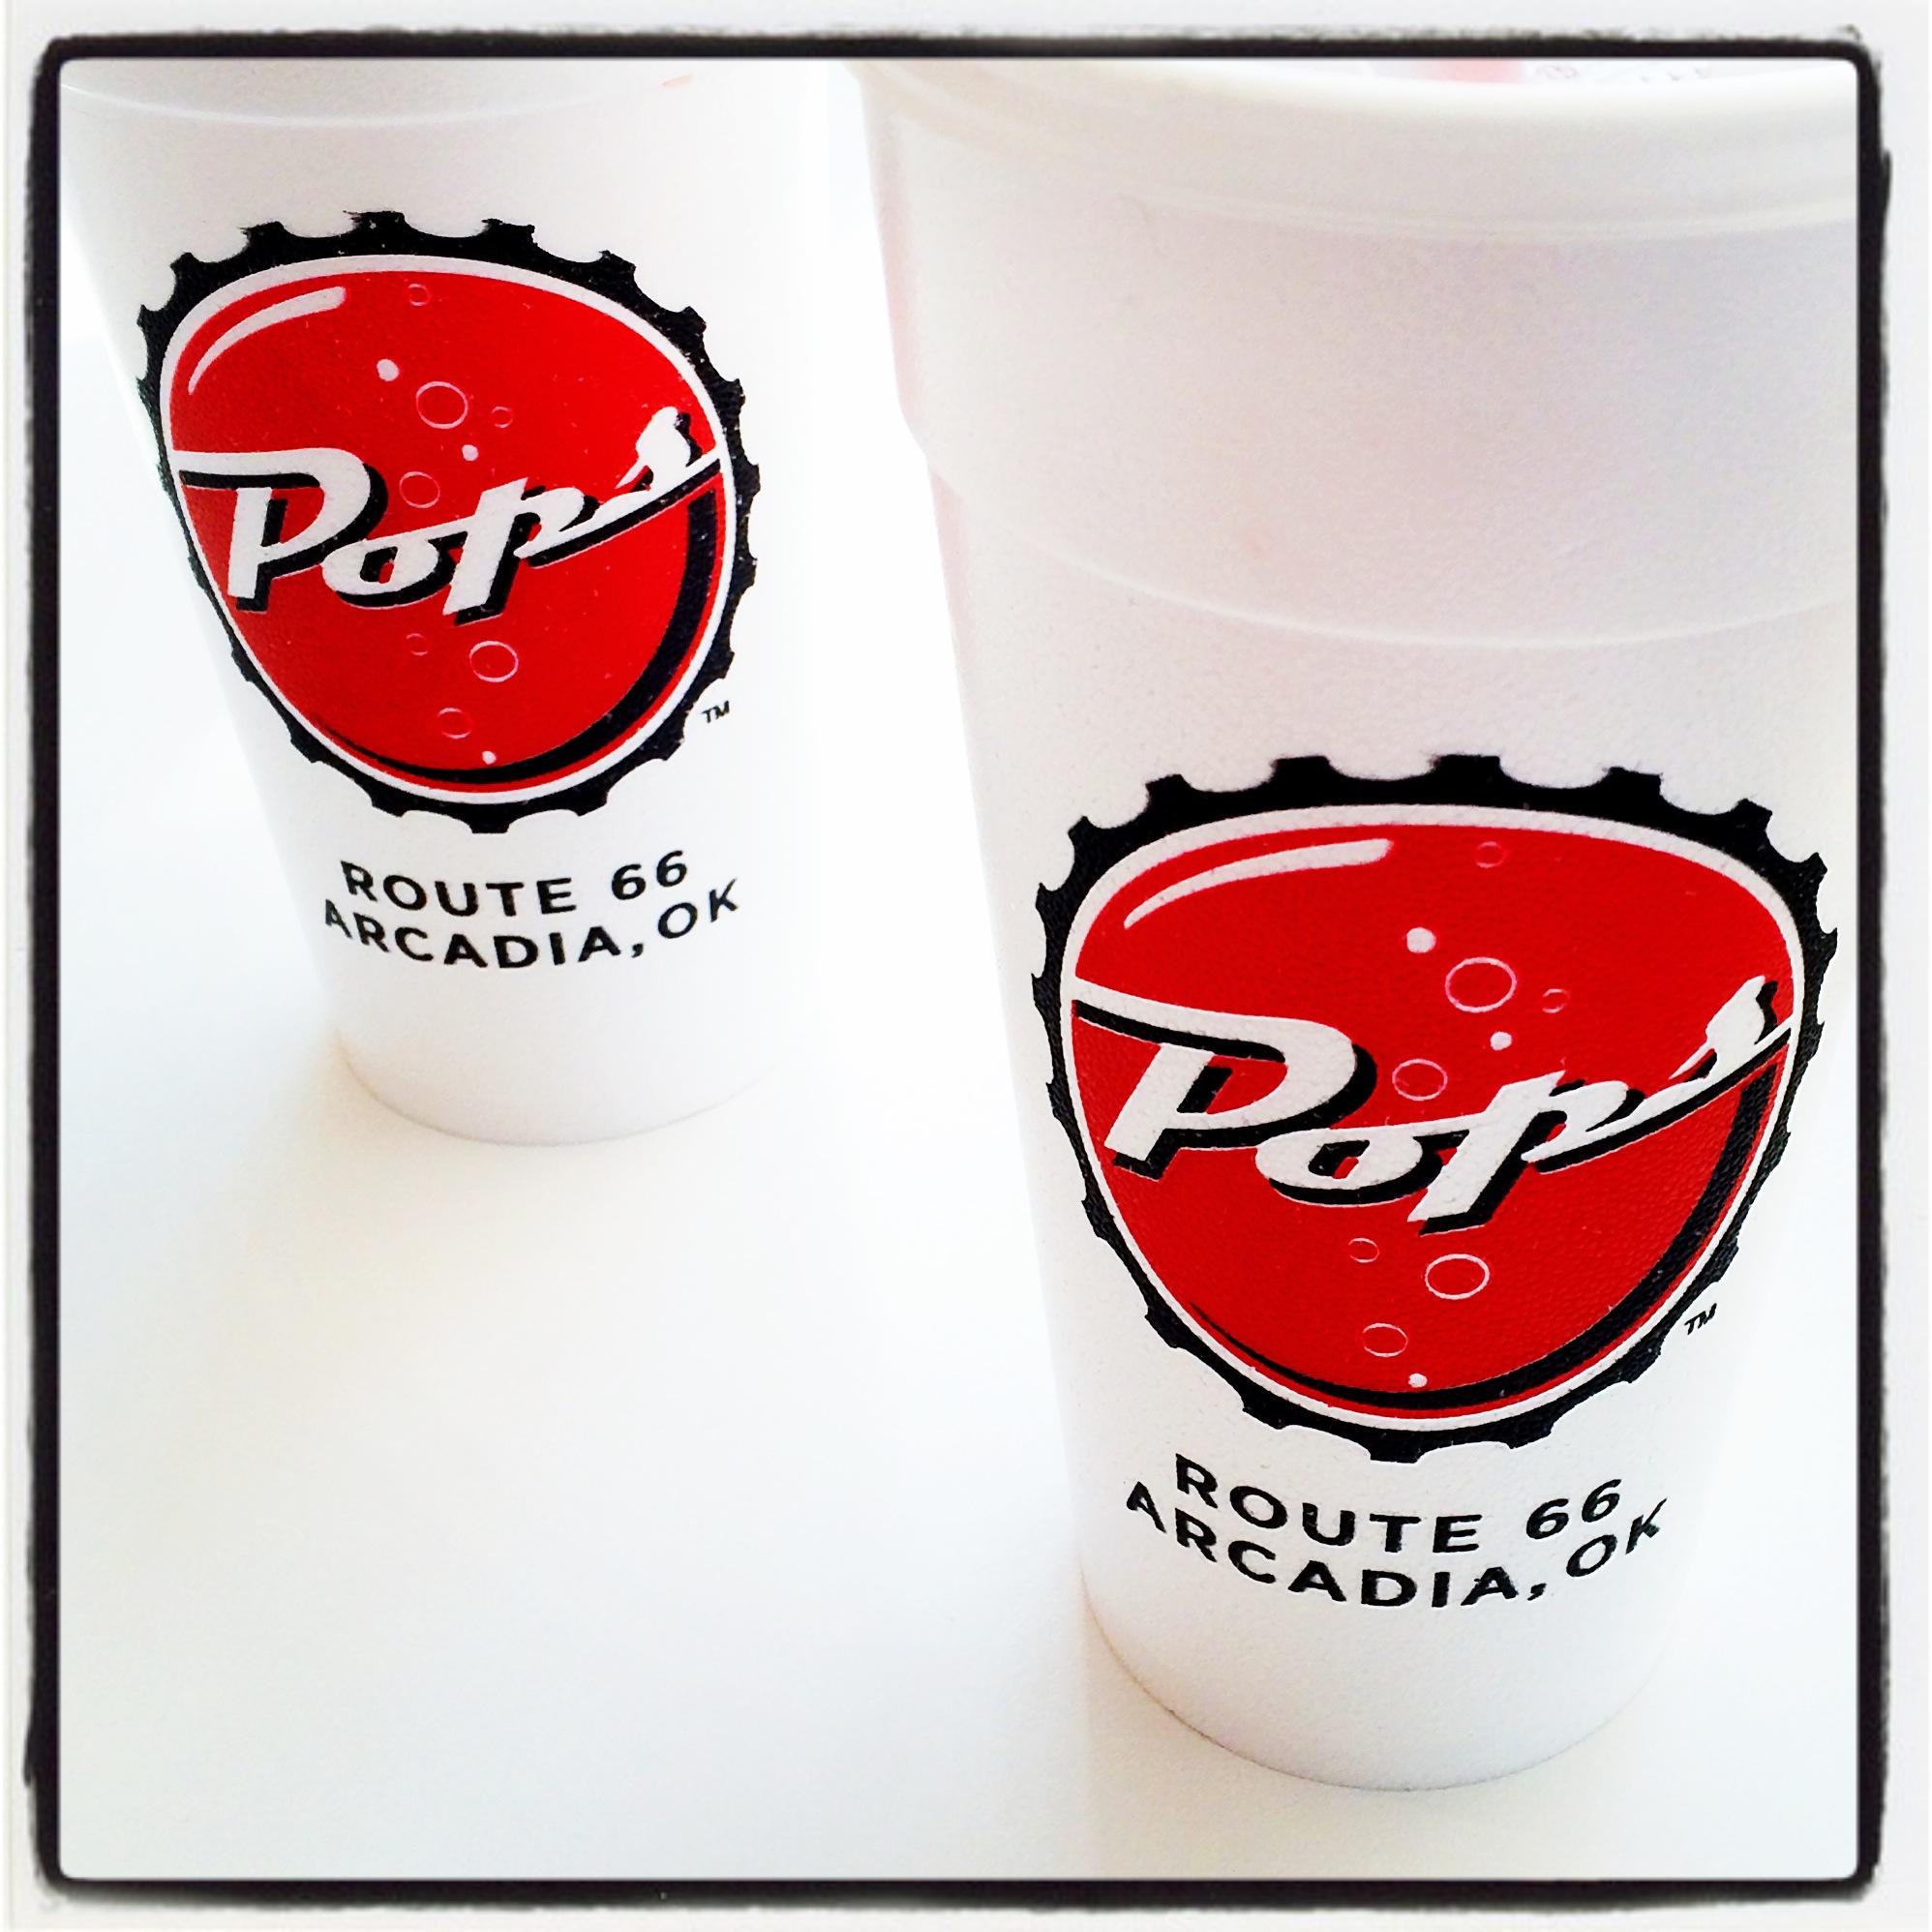 BOTTOMLESS FOUNTAIN SODA POP -  Choose from: Pepsi • Coke • Diet Coke • Dr Pepper  •  Diet Dr Pepper • Round Barn Root Beer  •  Sierra Mist • Mountain Dew • Cheerwine  •  Roy's Fresh Lemonade